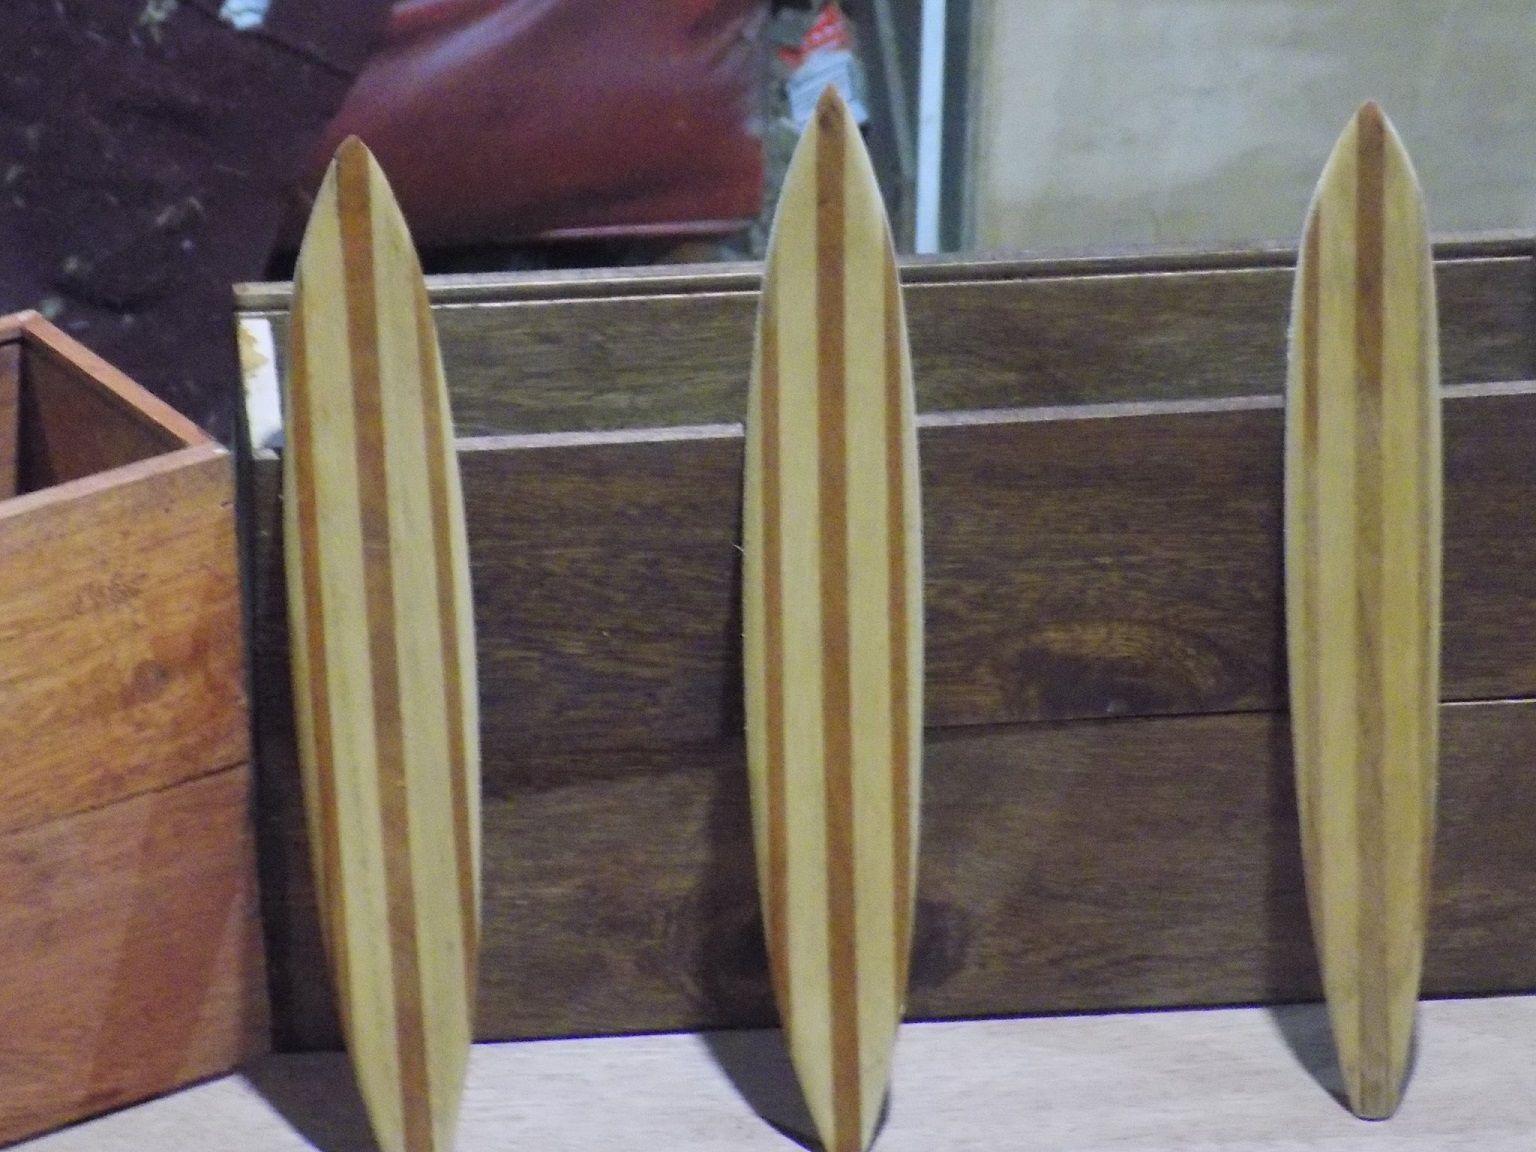 Gustavo Lumbreras Surfing Surfer Sculpture Statue Facebook Page Https Www Facebook Com Gustavo Lumbreras 50 Lst 16 Surf Art Knife Block Magnetic Knife Strip